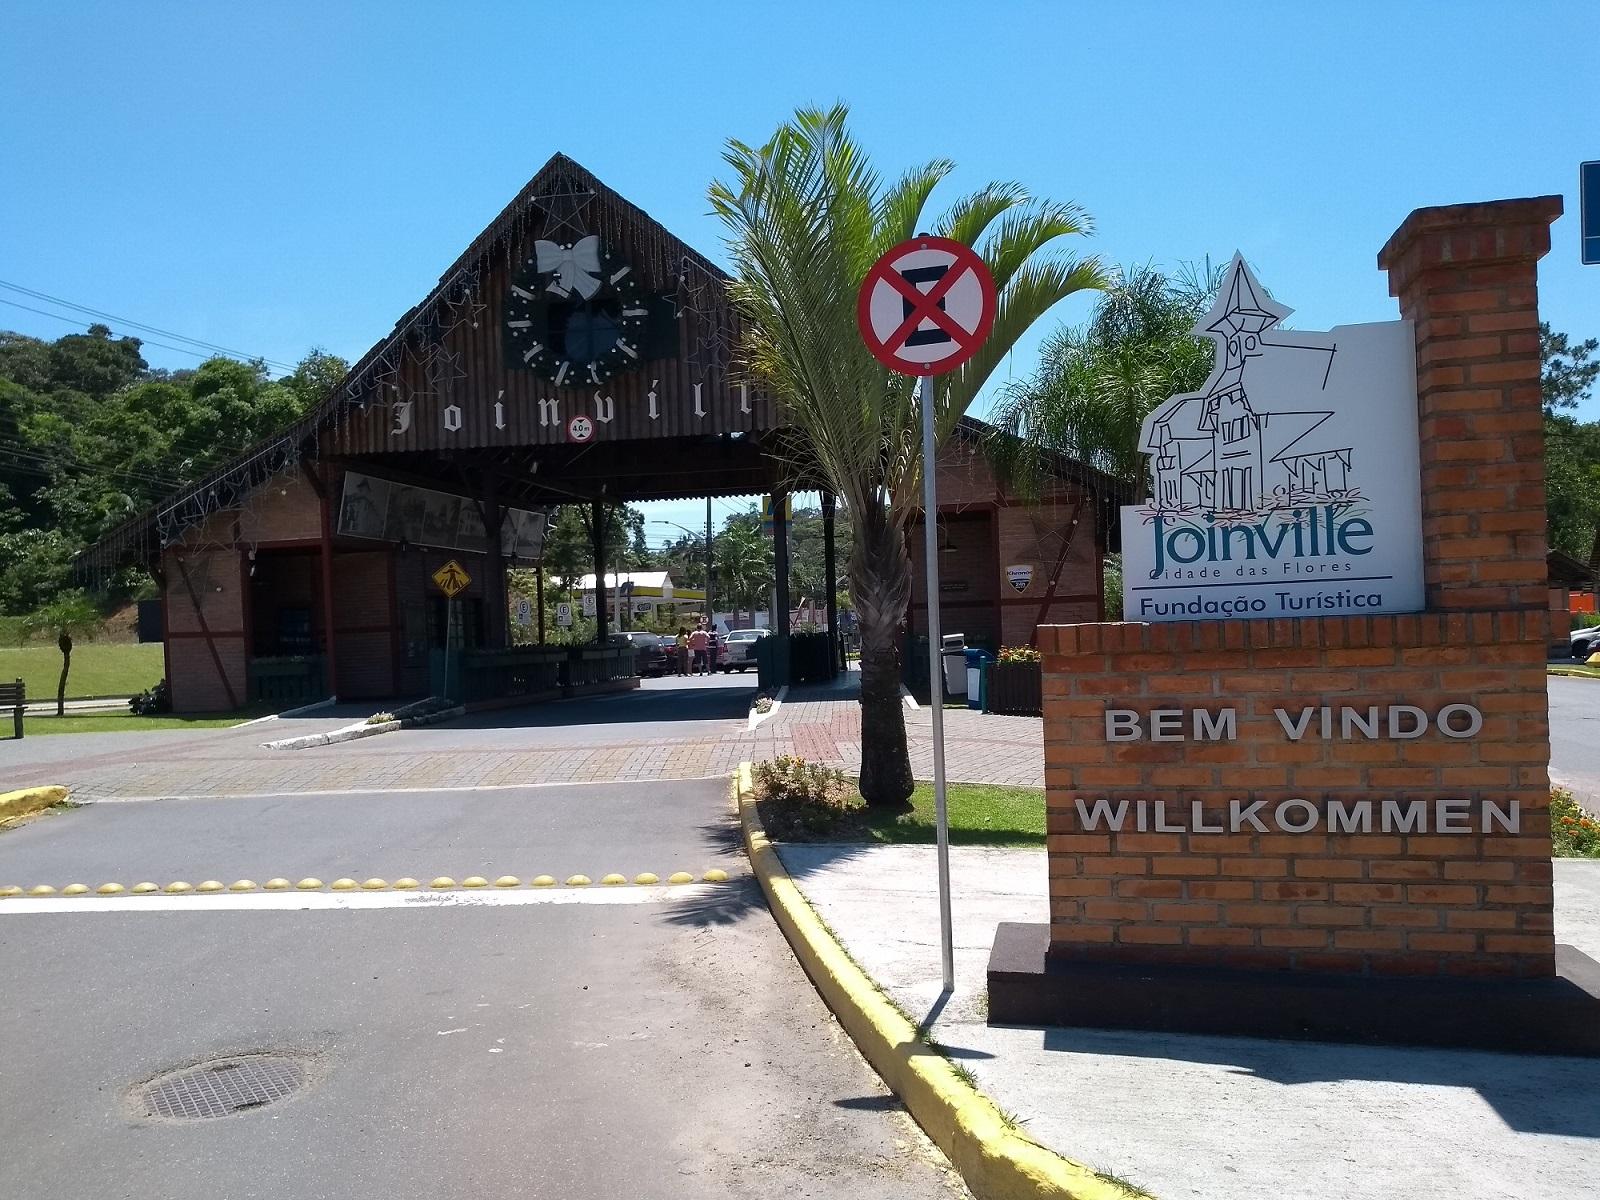 0ce37a5d3a Encontro de Blogueiros de viagem em Joinville